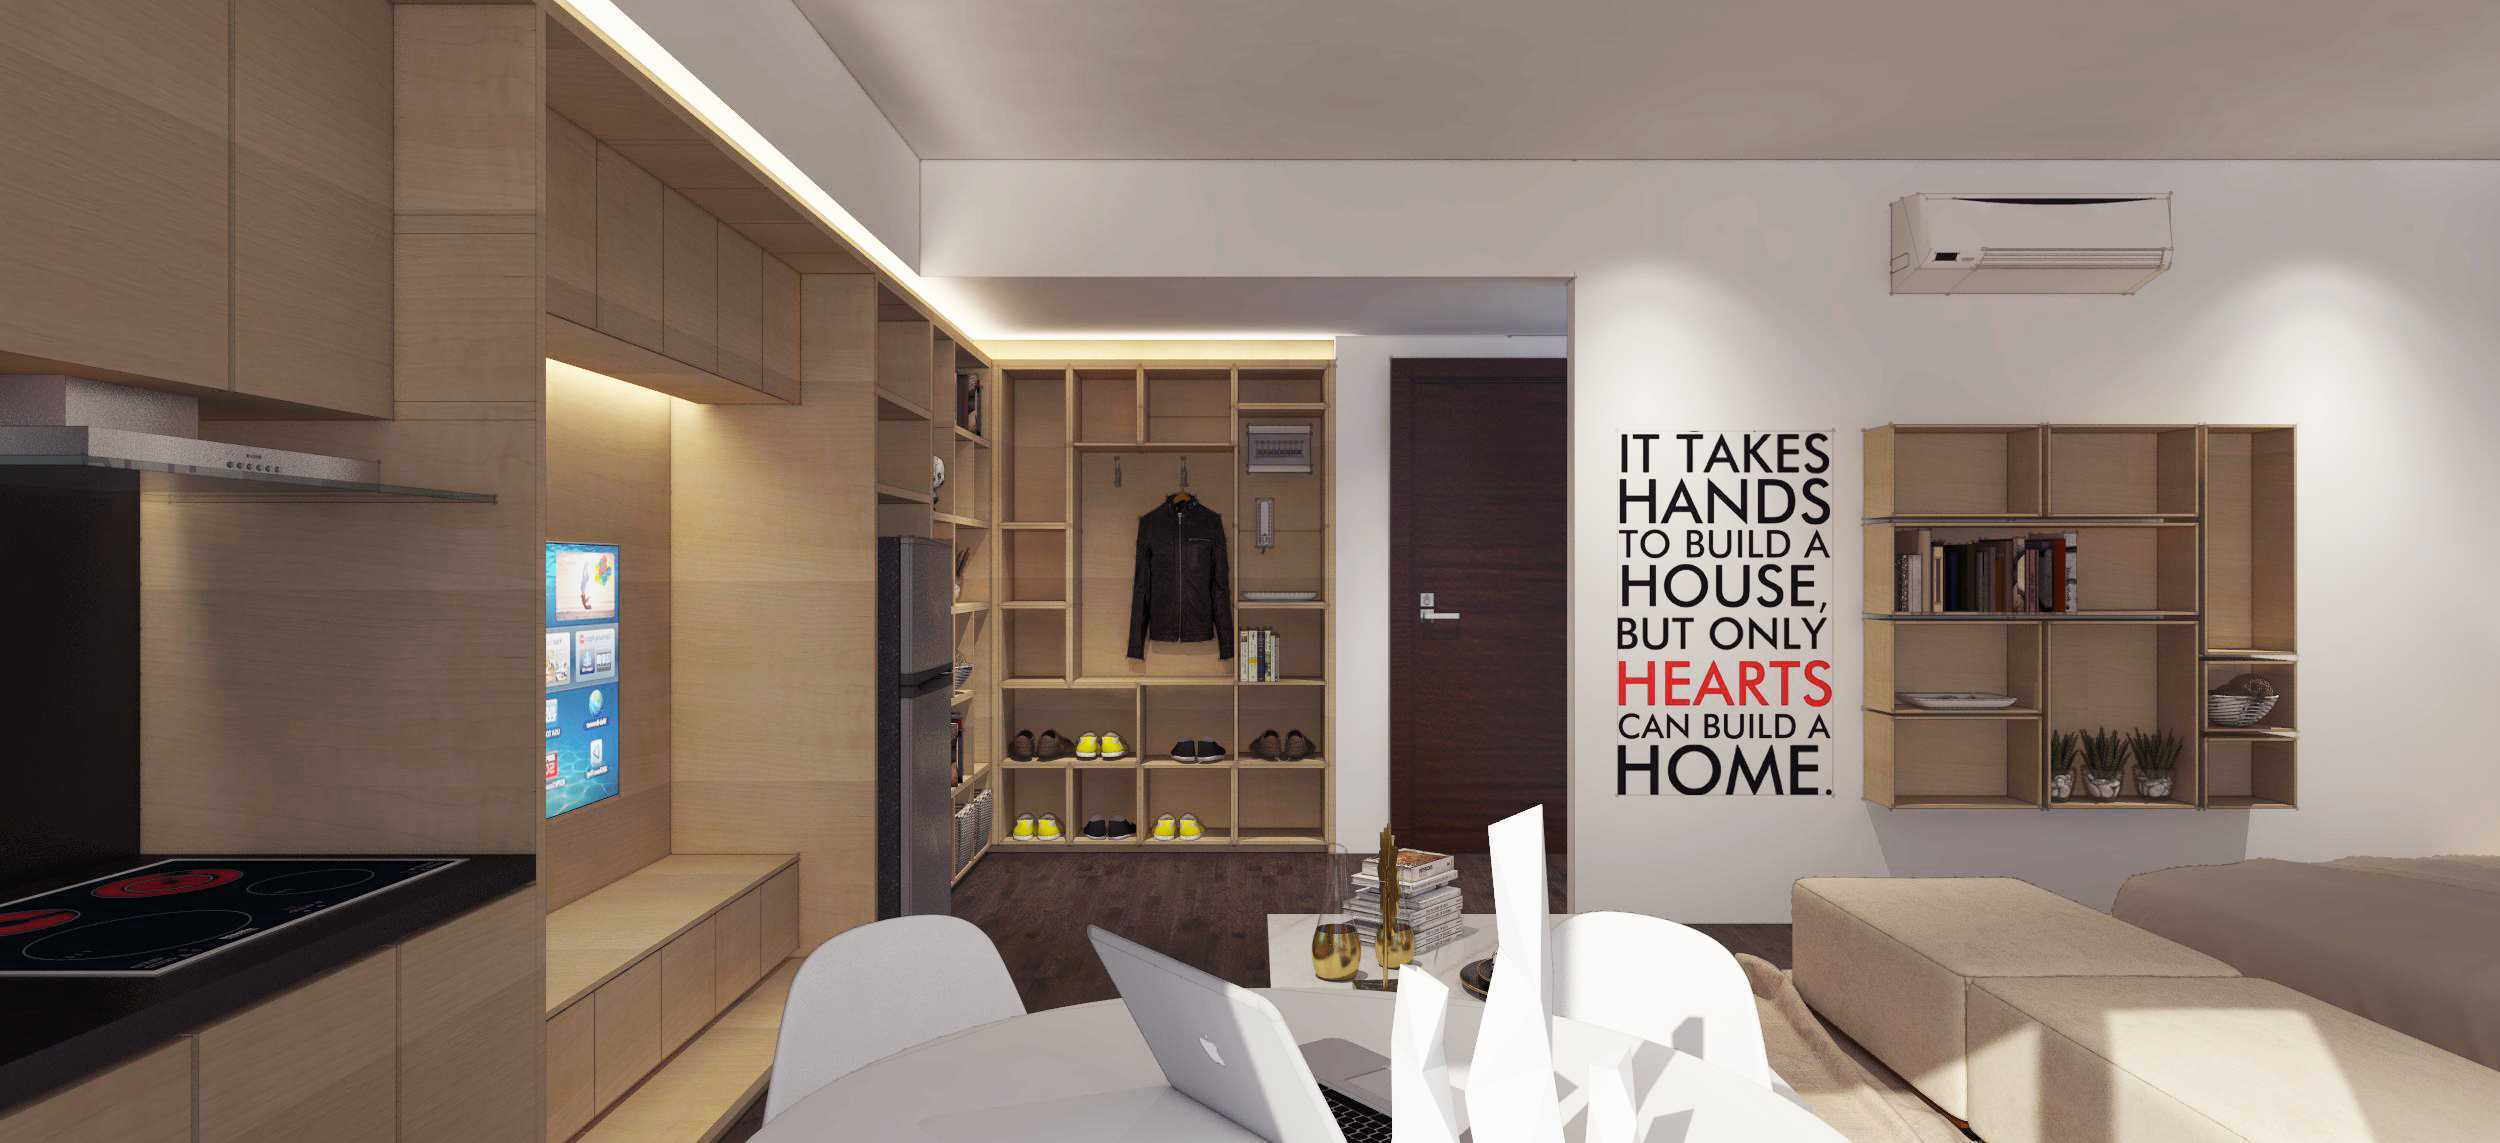 Ari Wibowo Design (Aw.d) R Apartment Kebun Jeruk, Jakarta Kebun Jeruk, Jakarta Apartment Room Modern  10004